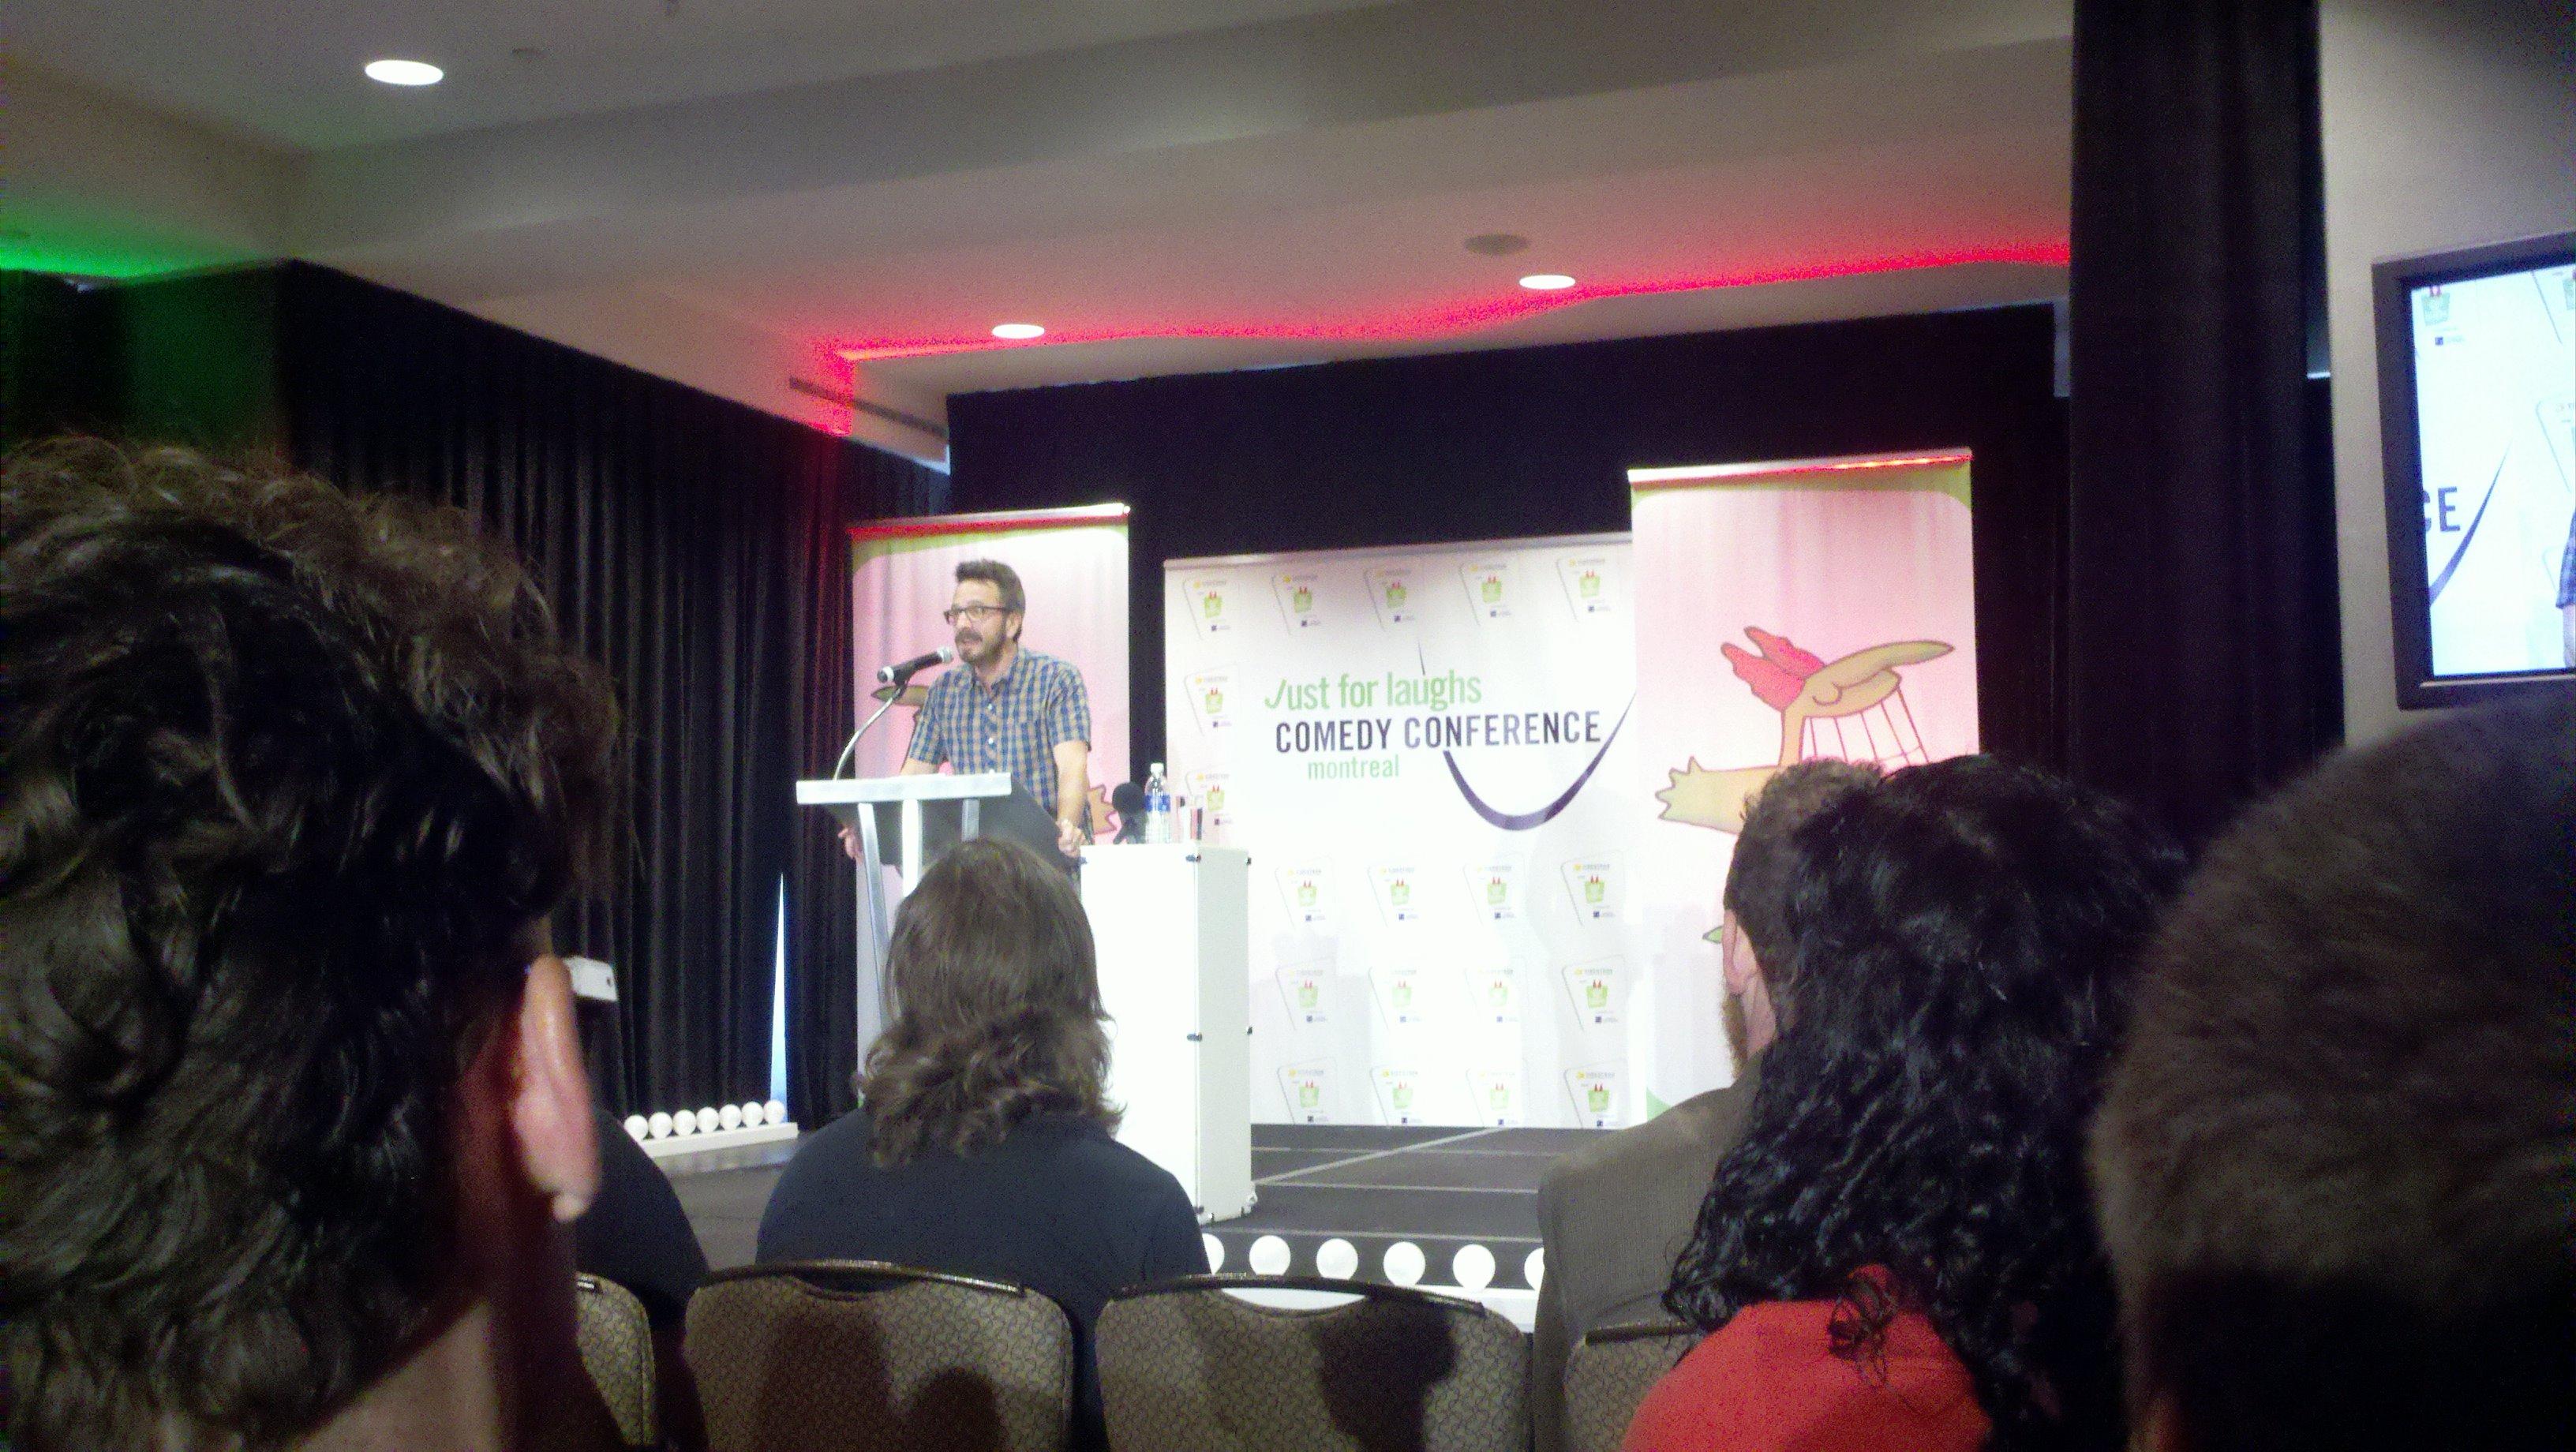 Marc Maron's powerful keynote address at Montreal's JFL 2011